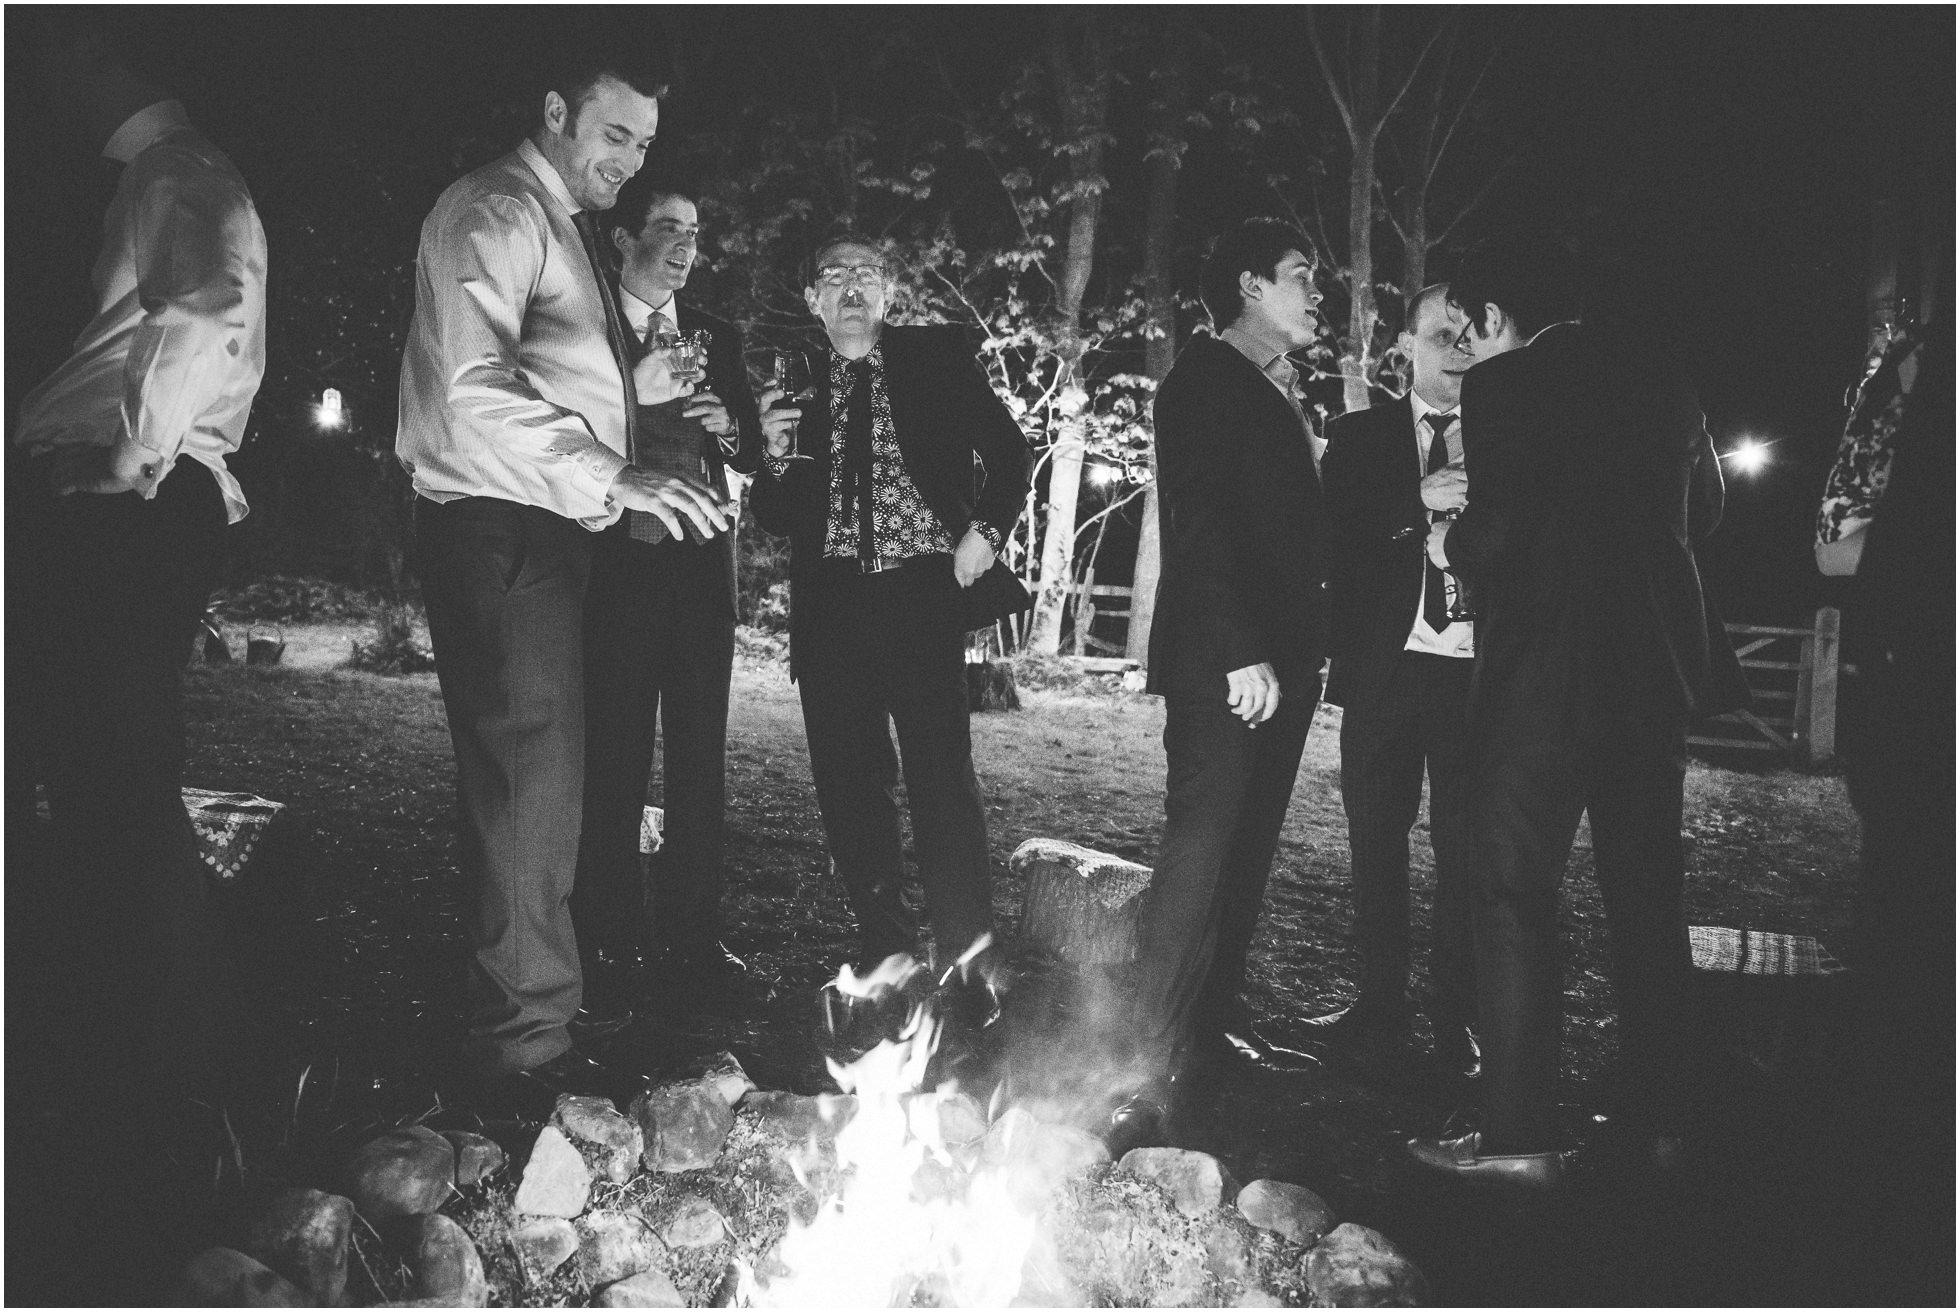 Cigars around the campfire in Stillington